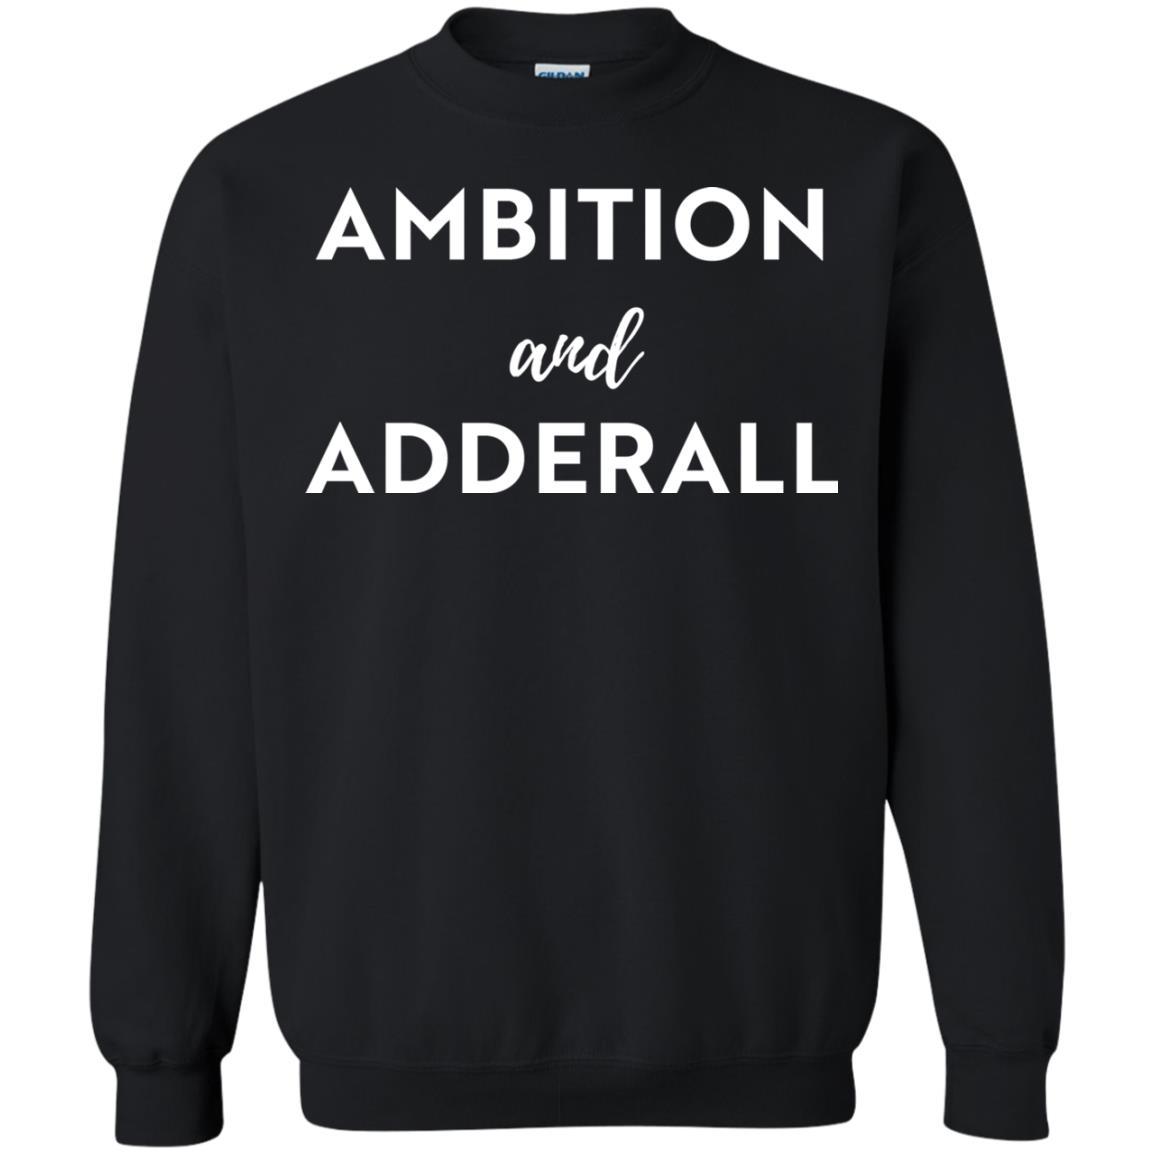 image 7 - Ambition and Adderall T-shirt, Sweatshirt